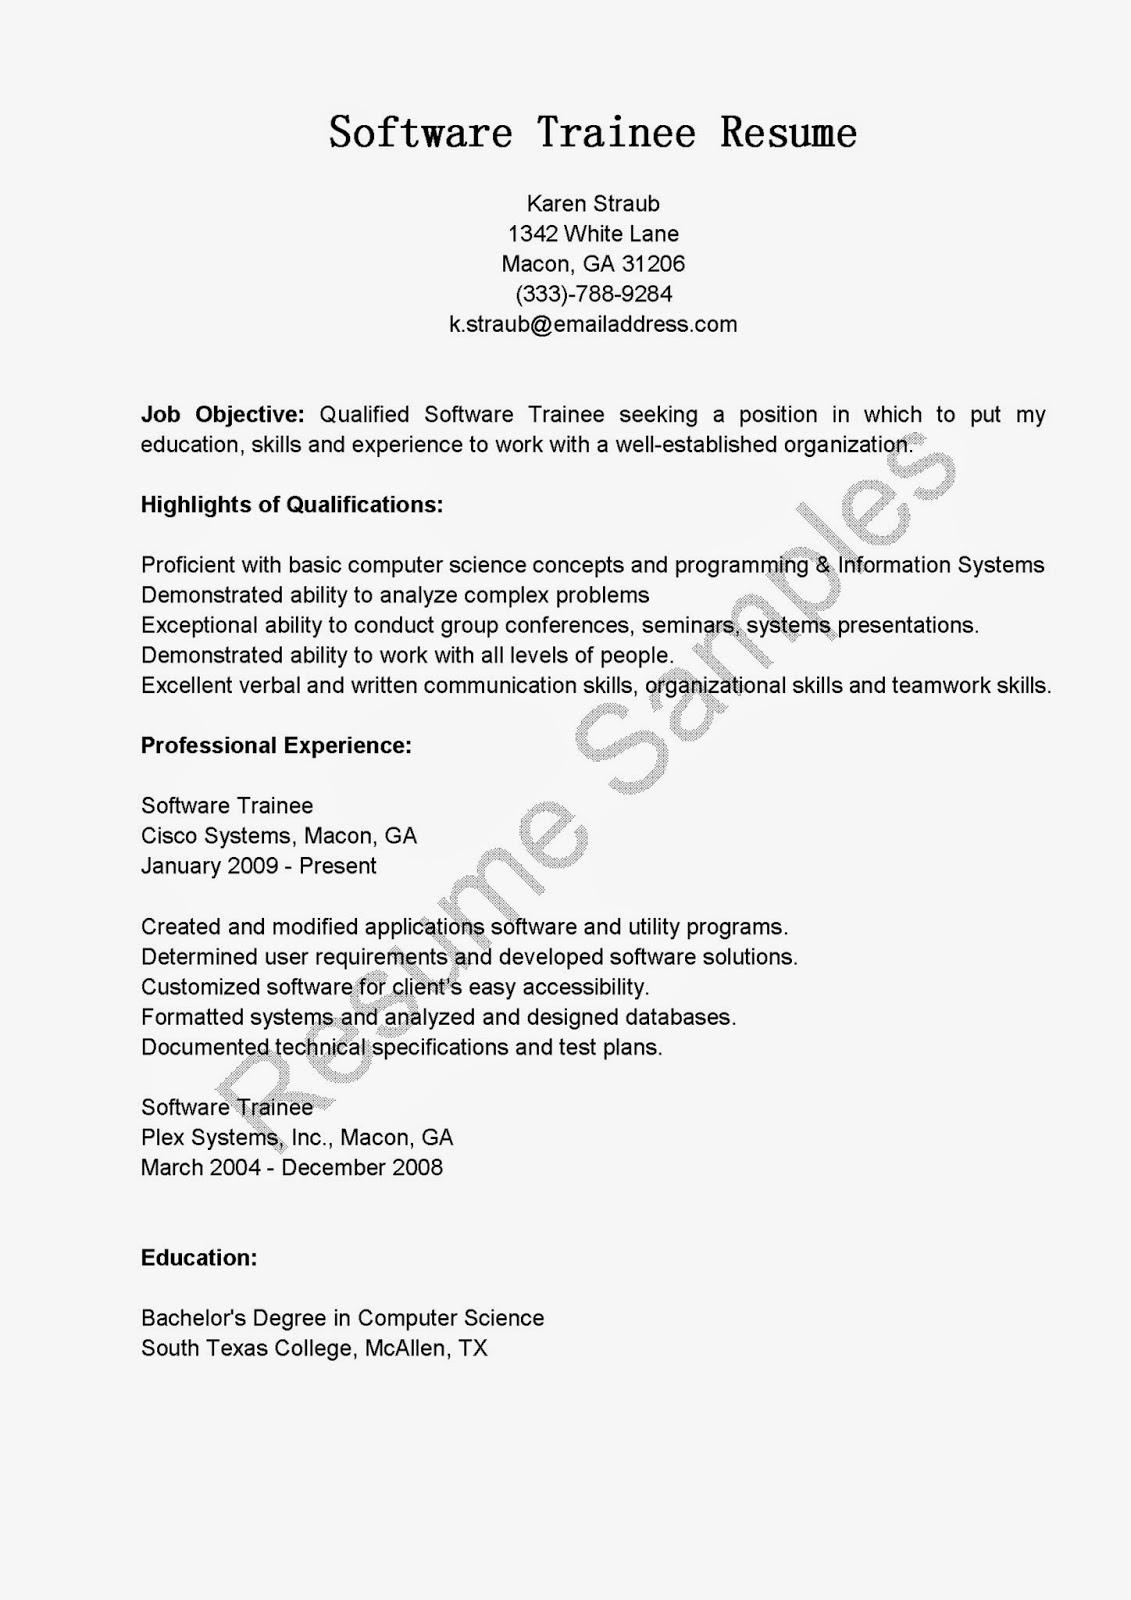 resume sles software trainee resume sle